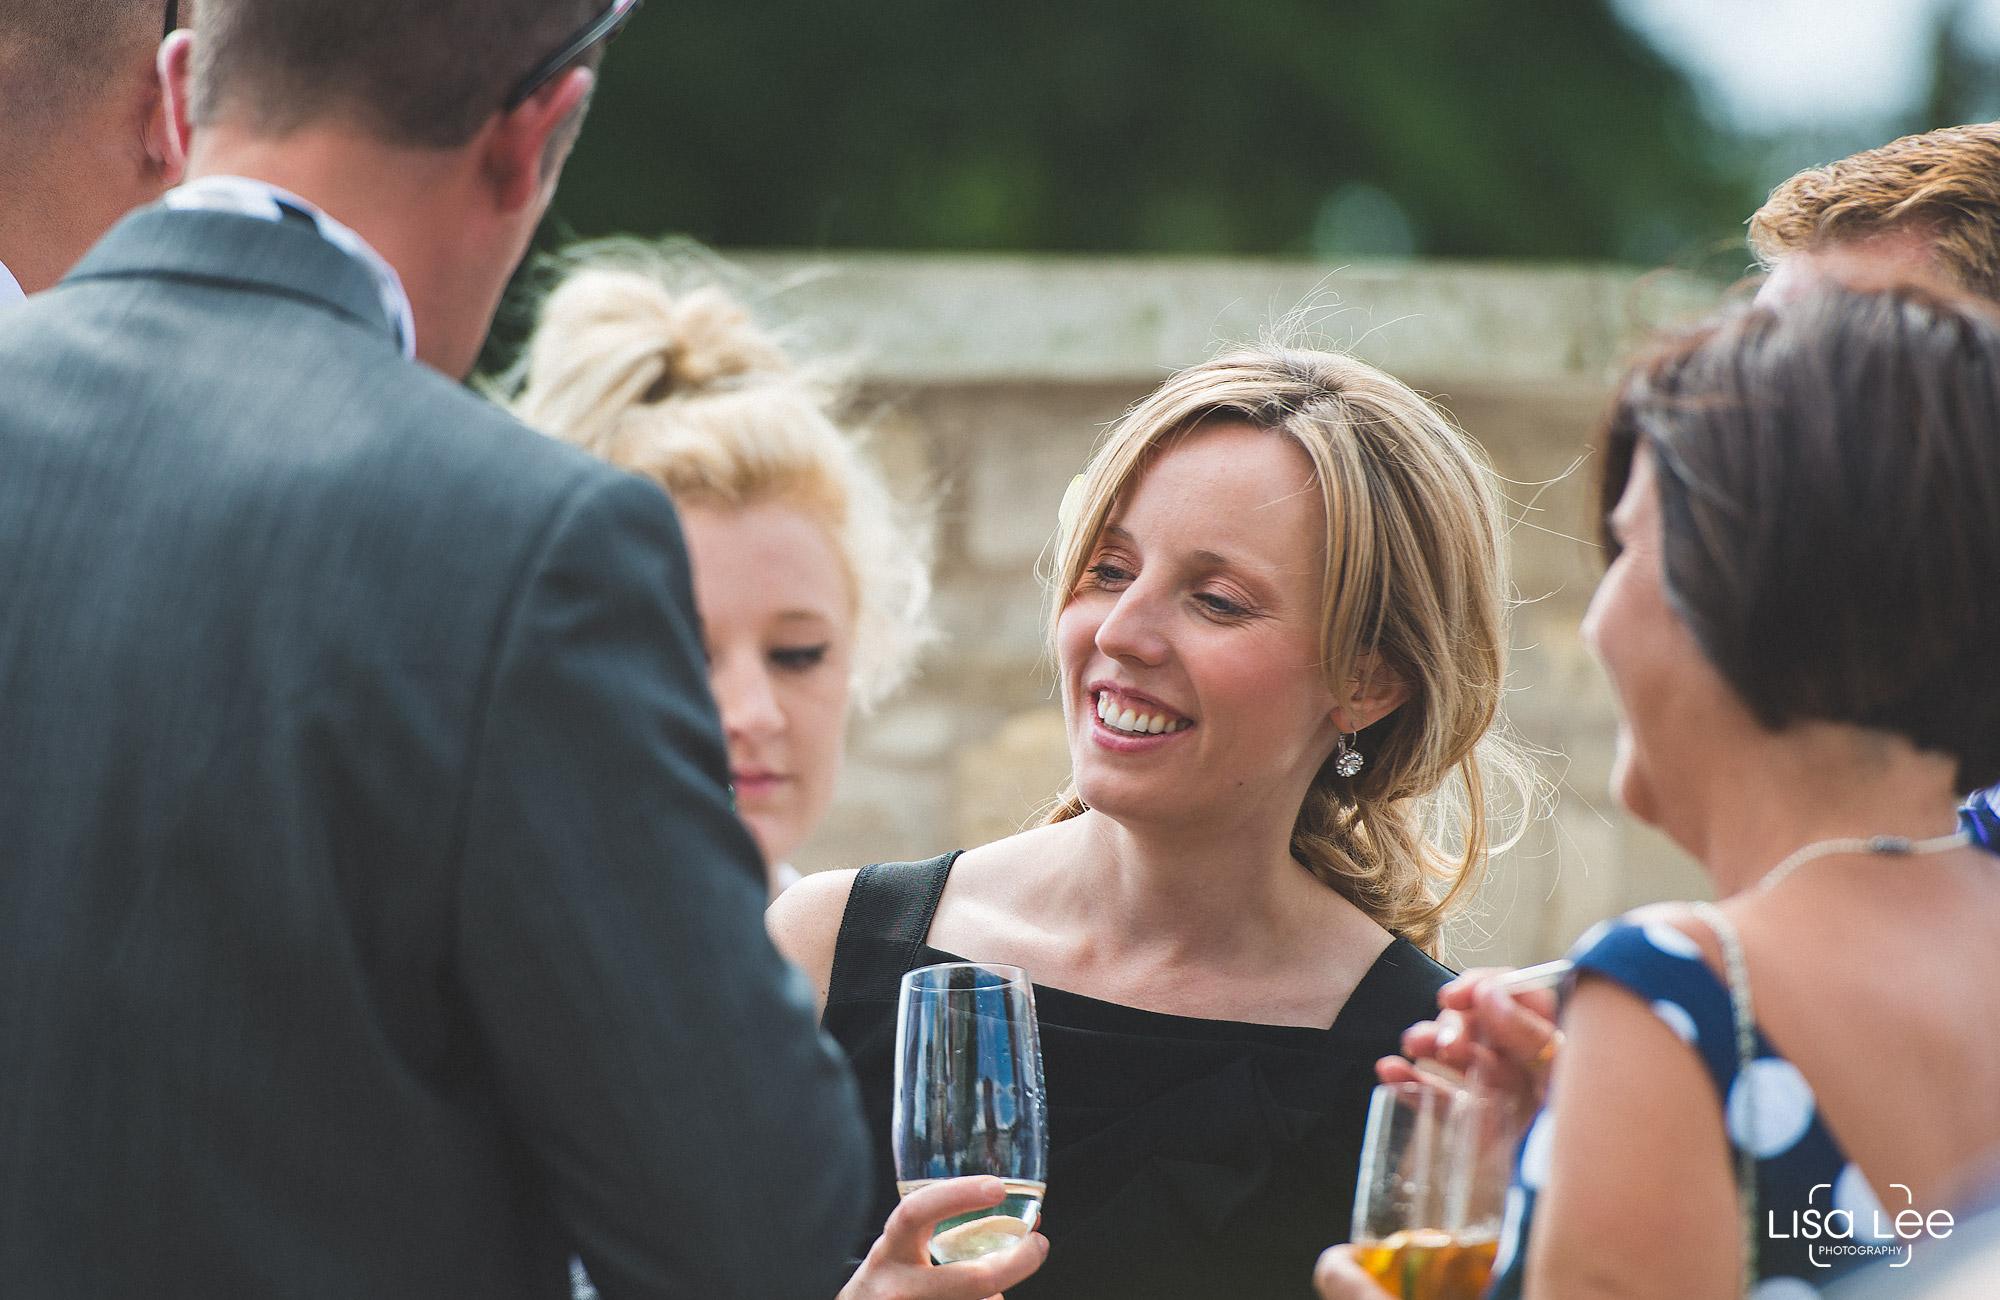 lisa-lee-wedding-photography-christchurch-dorset-guests2.jpg